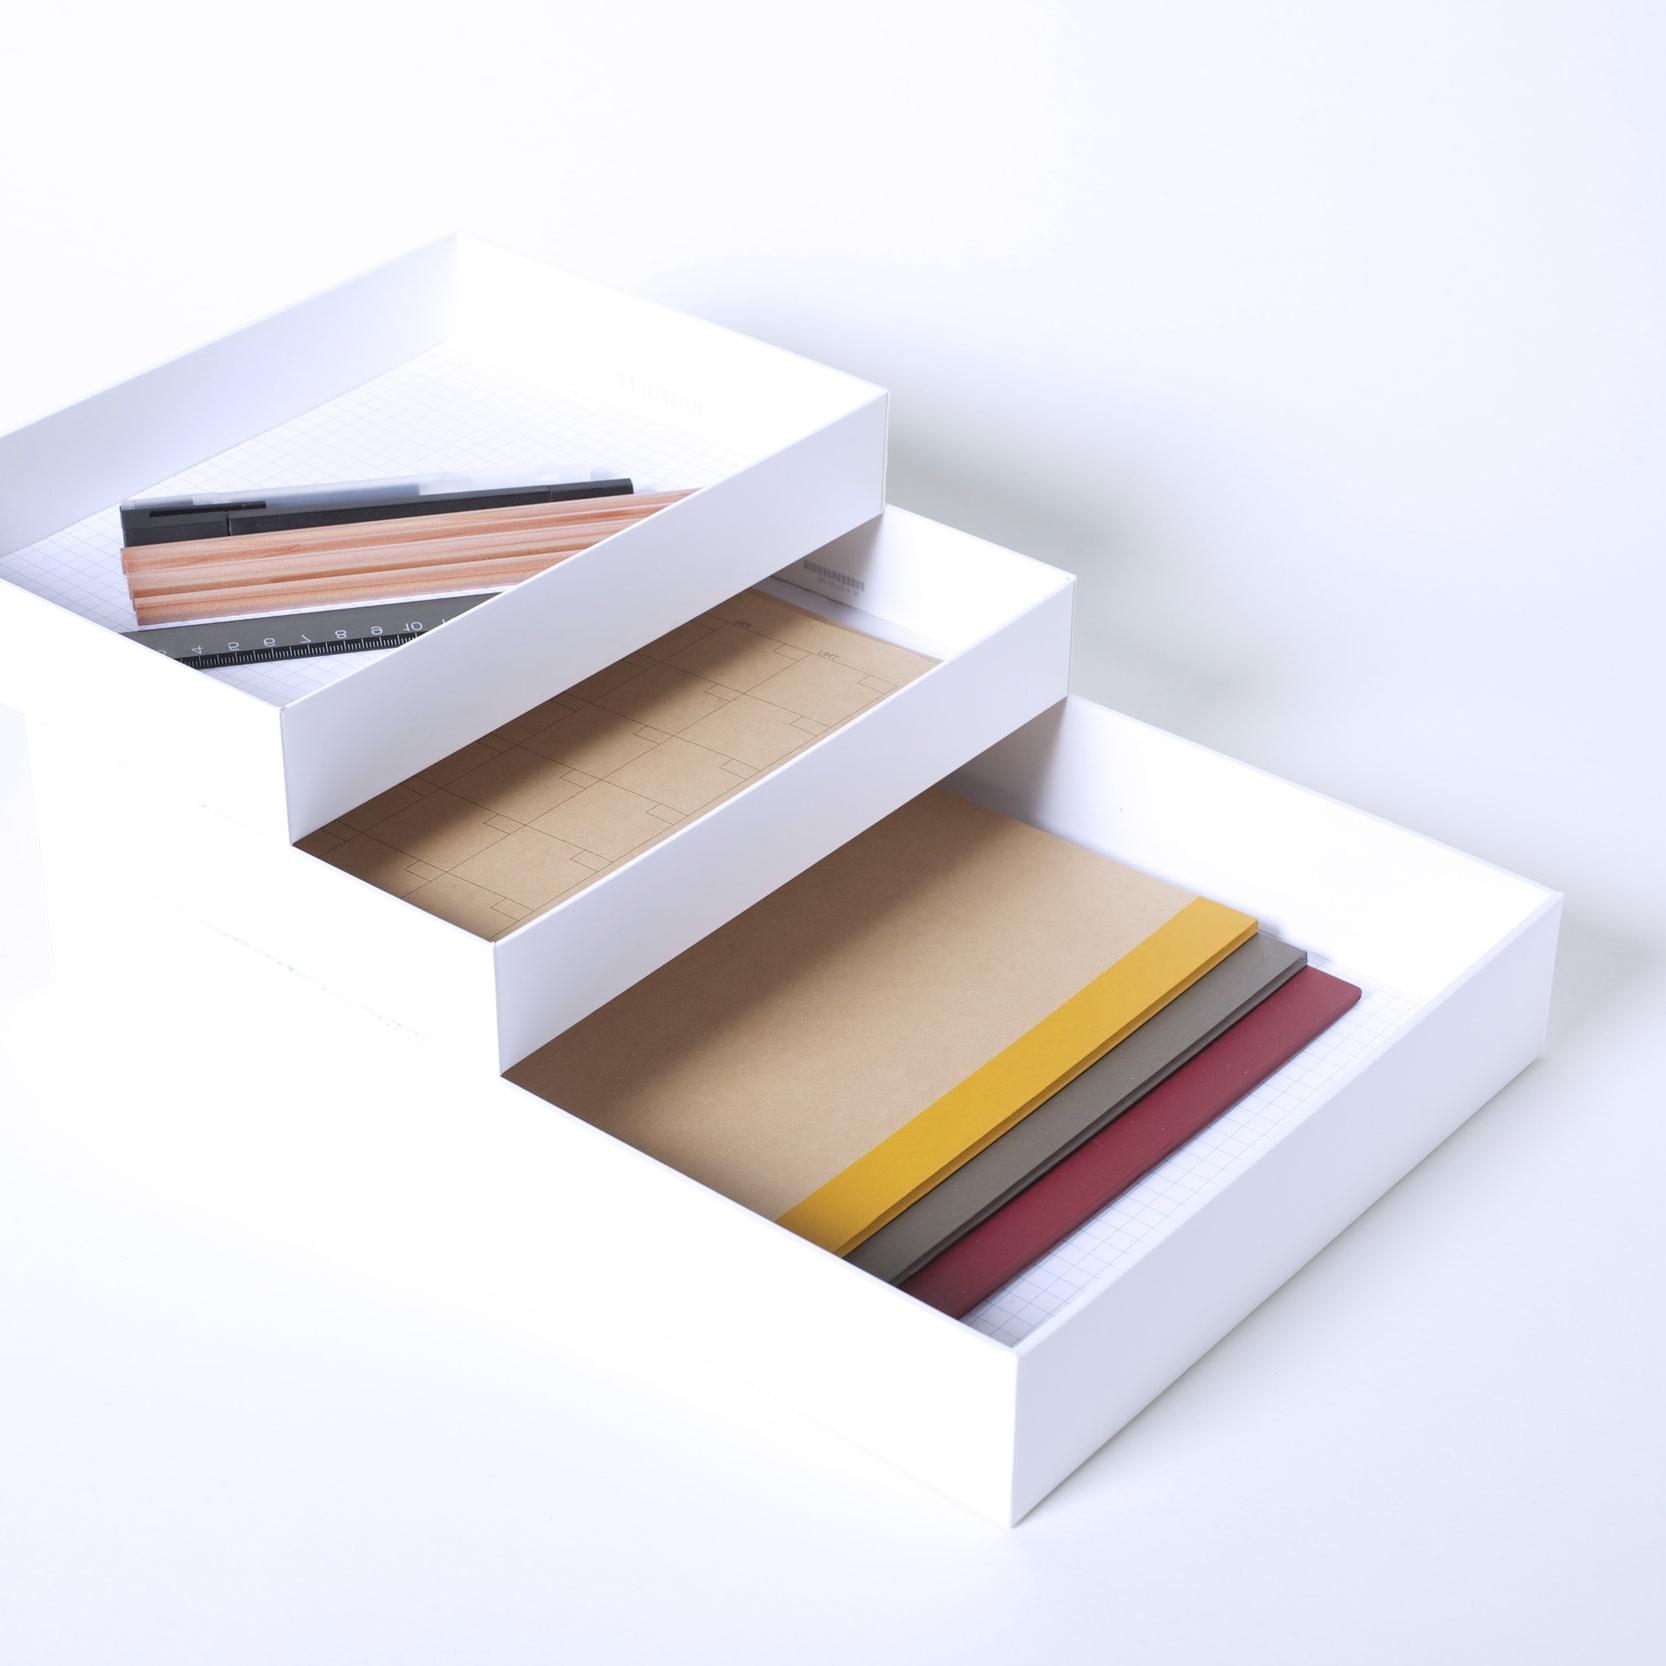 PaperTray - 2 iPad boxes + 1 MacBook Pro Box